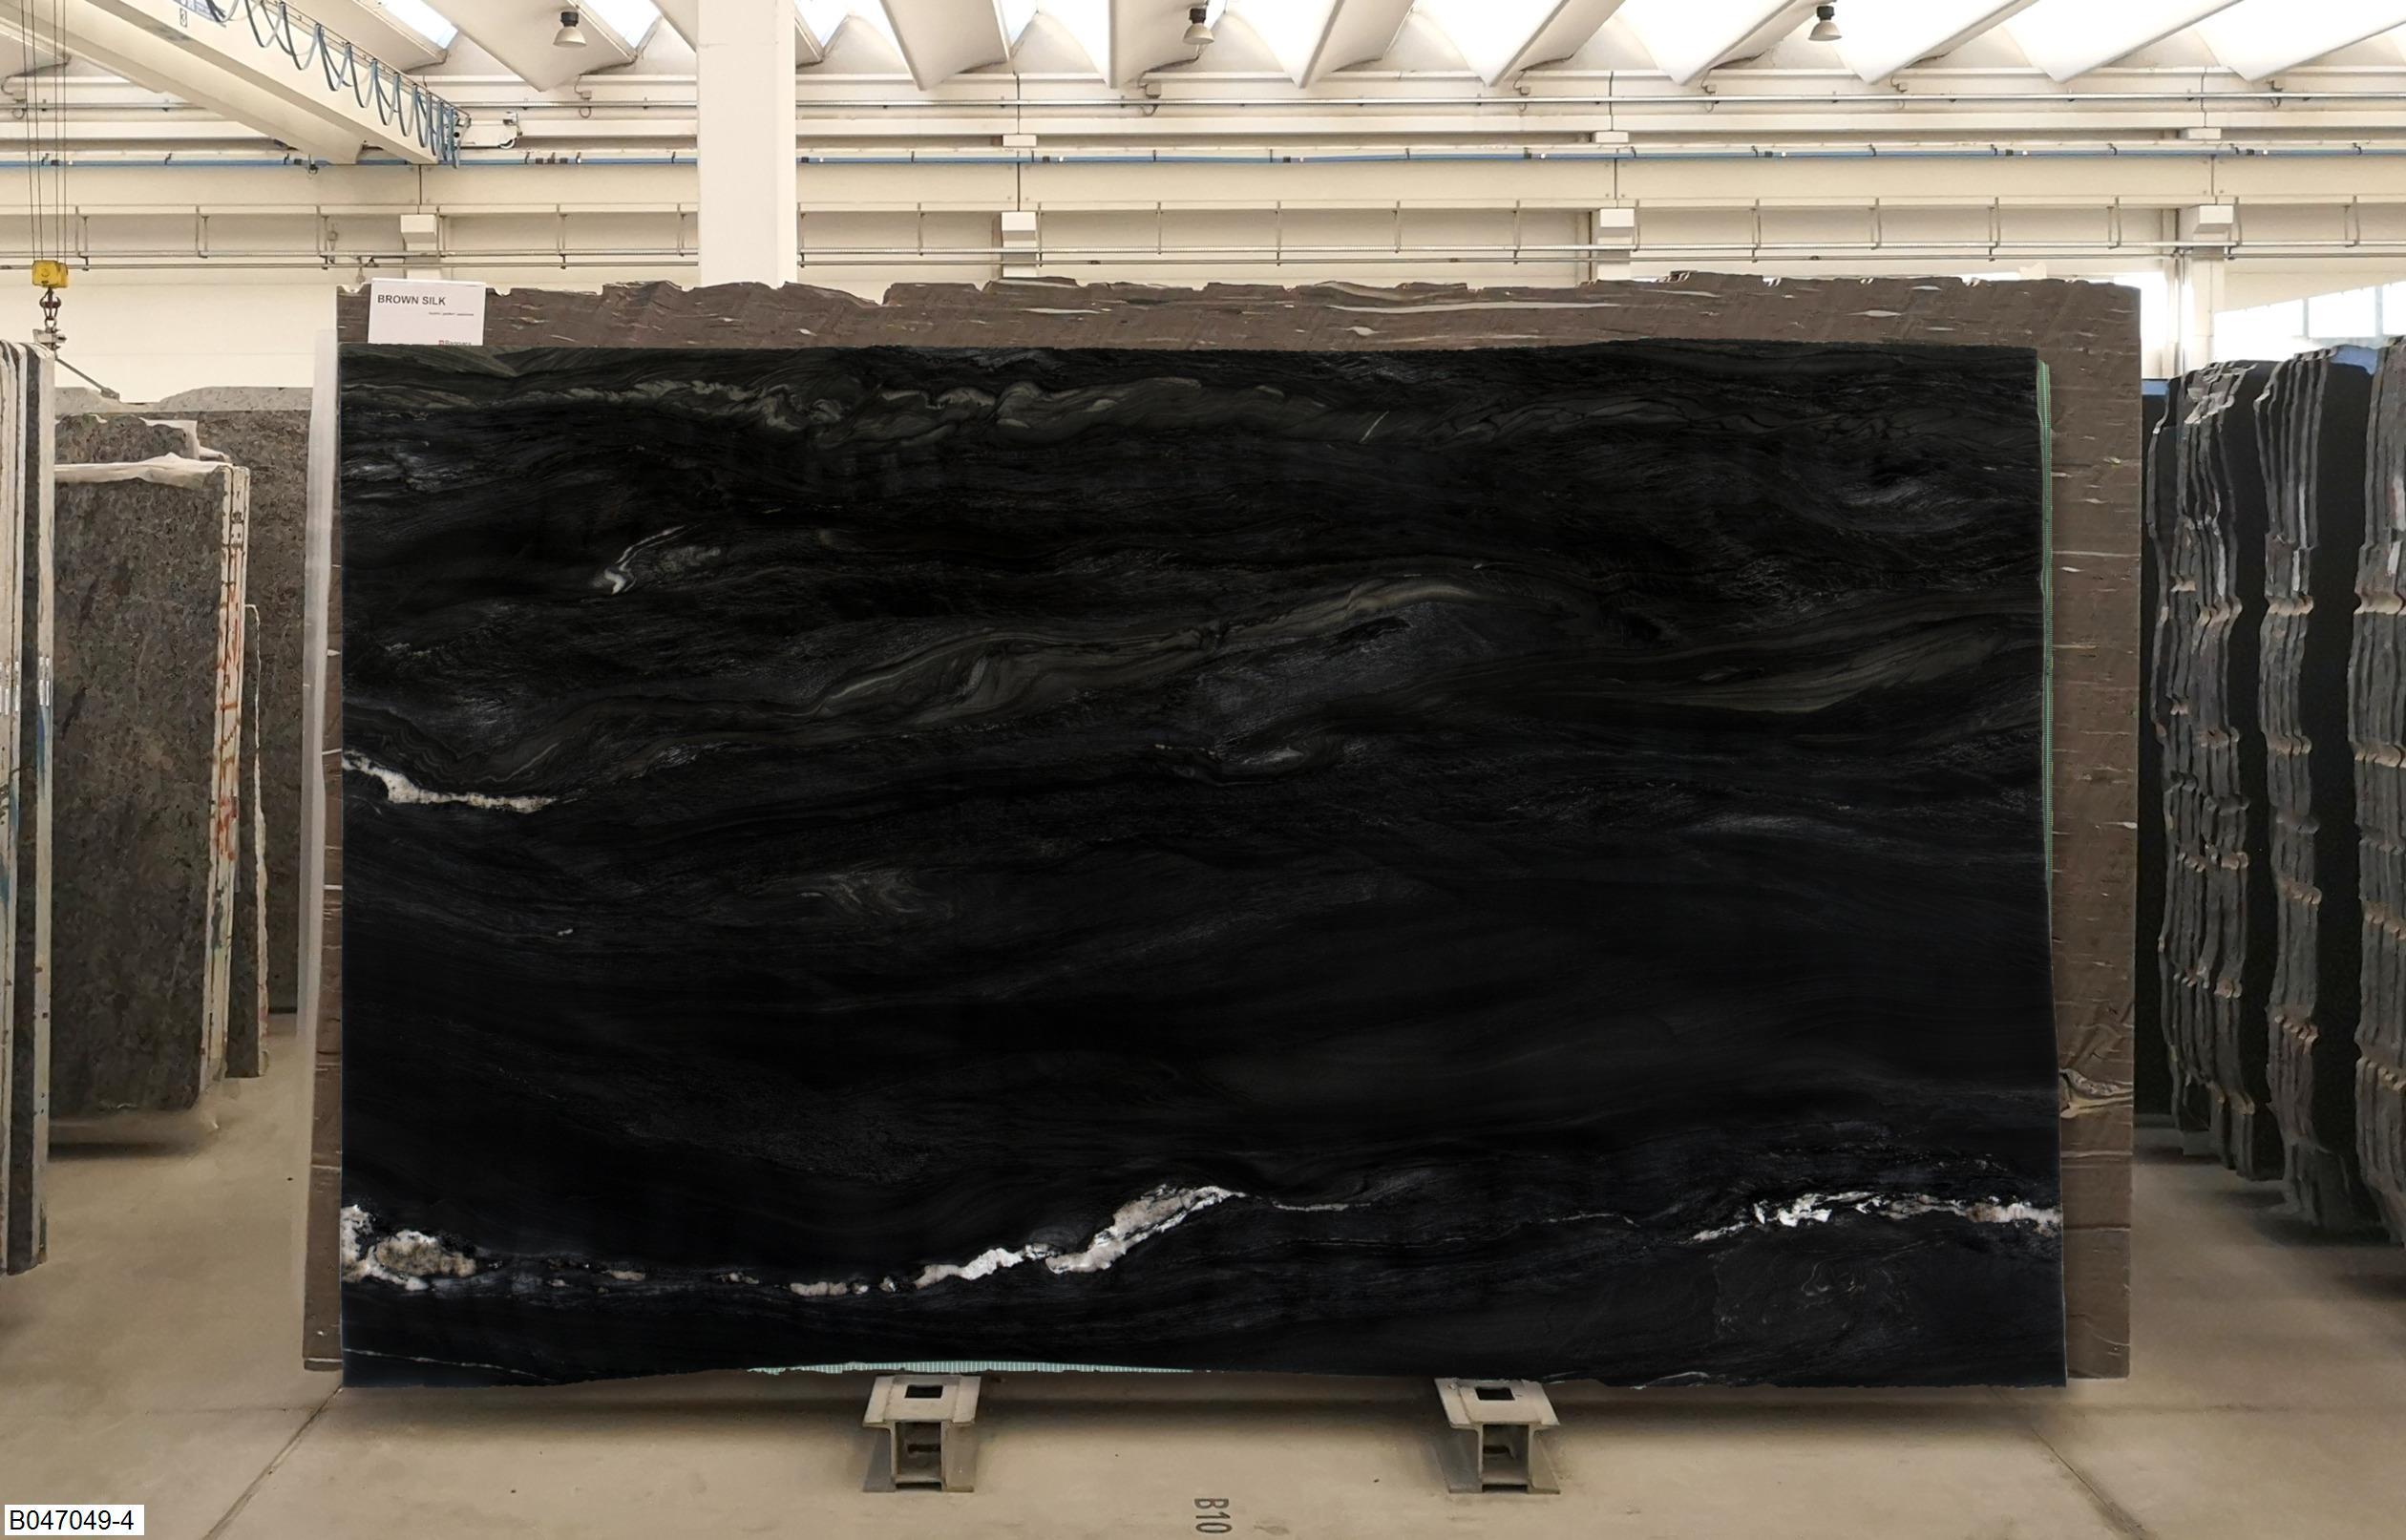 BLACK TEMPEST - LASTRE LUCIDE-MACCHIA APERTA Foto: 1_59155_39154.jpg